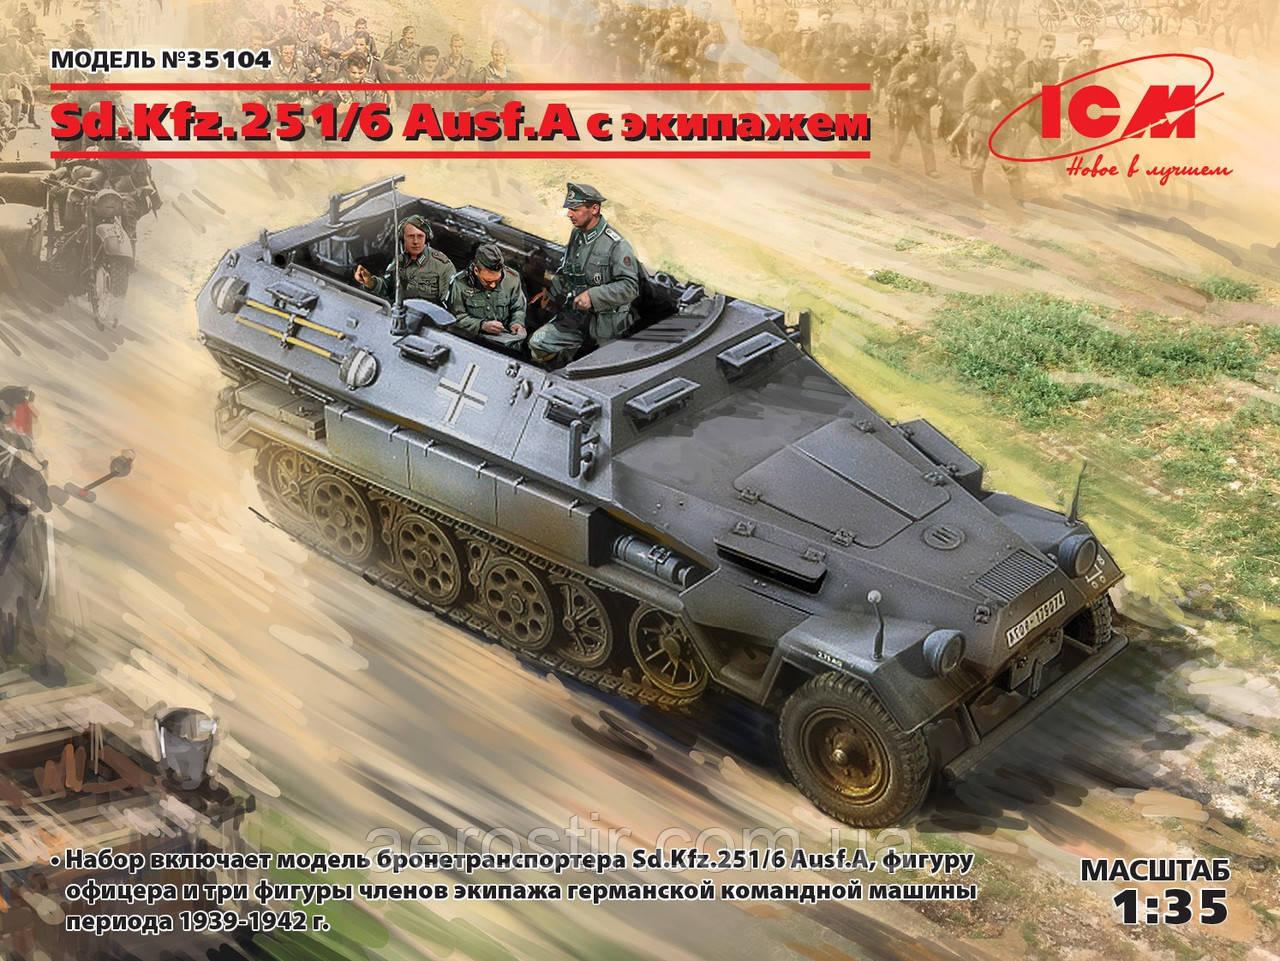 Sd.Kfz.251/6 Ausf.A с экипажем 1/35 ICM 35104